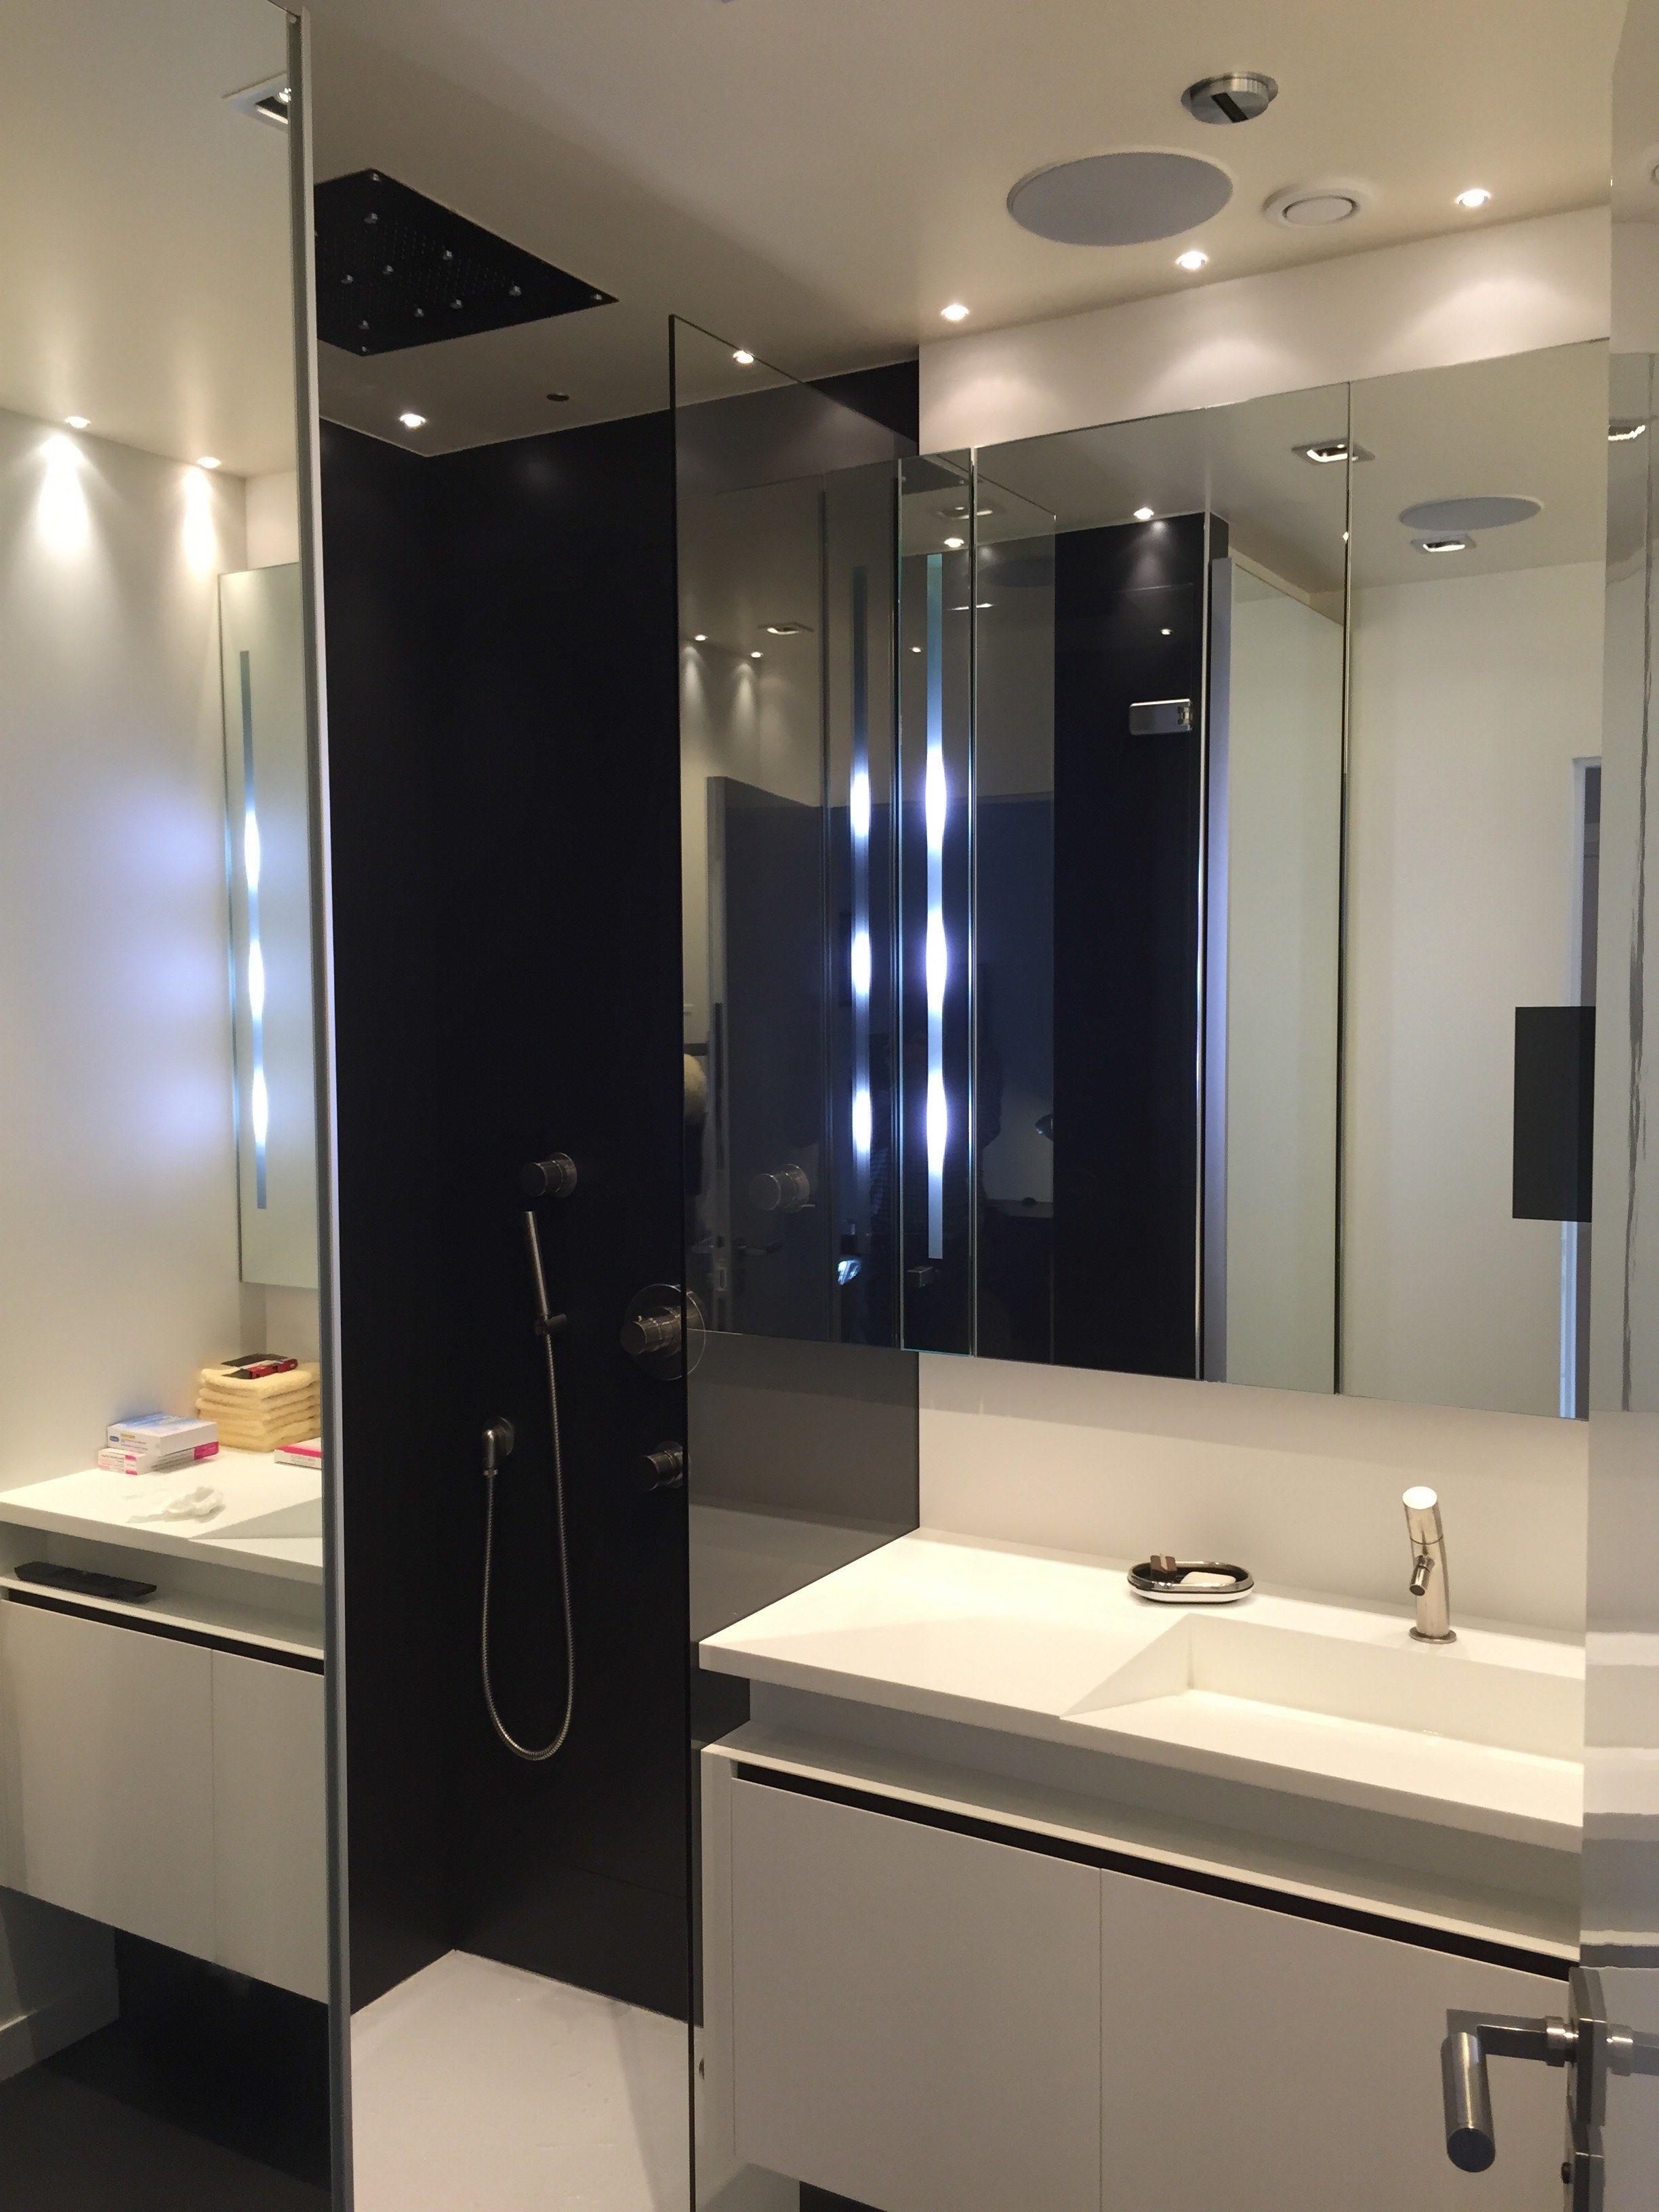 Miroir Salle De Bain Tv ~ salle de bain cr ation pierre valcke robinetterie stella tv dans